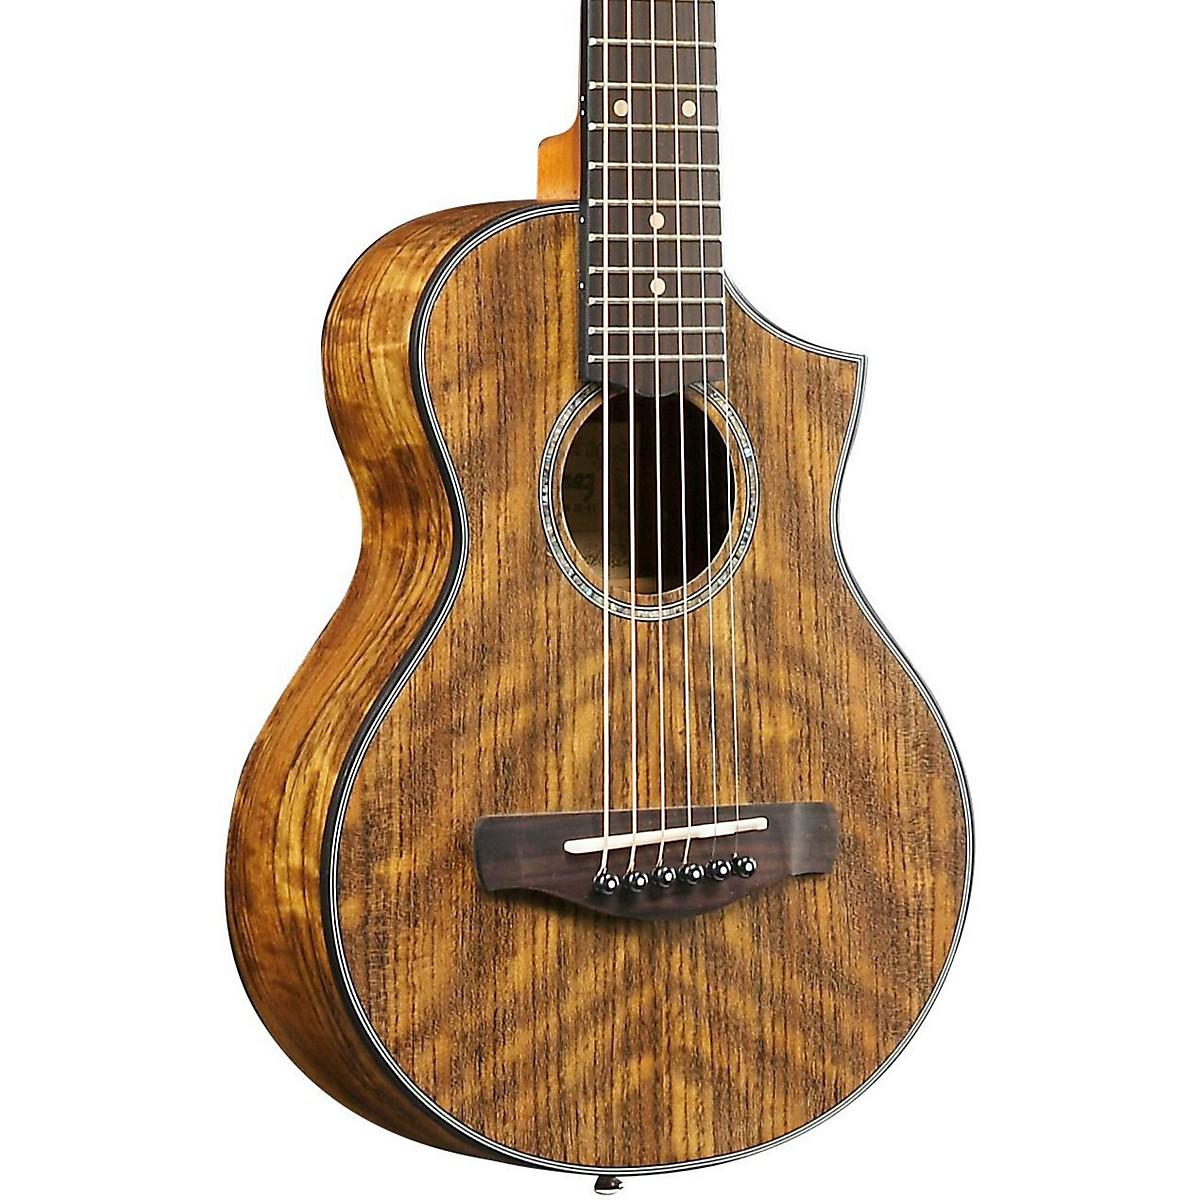 Ibanez EWP14OPN Exotic Wood Piccolo Acoustic Guitar